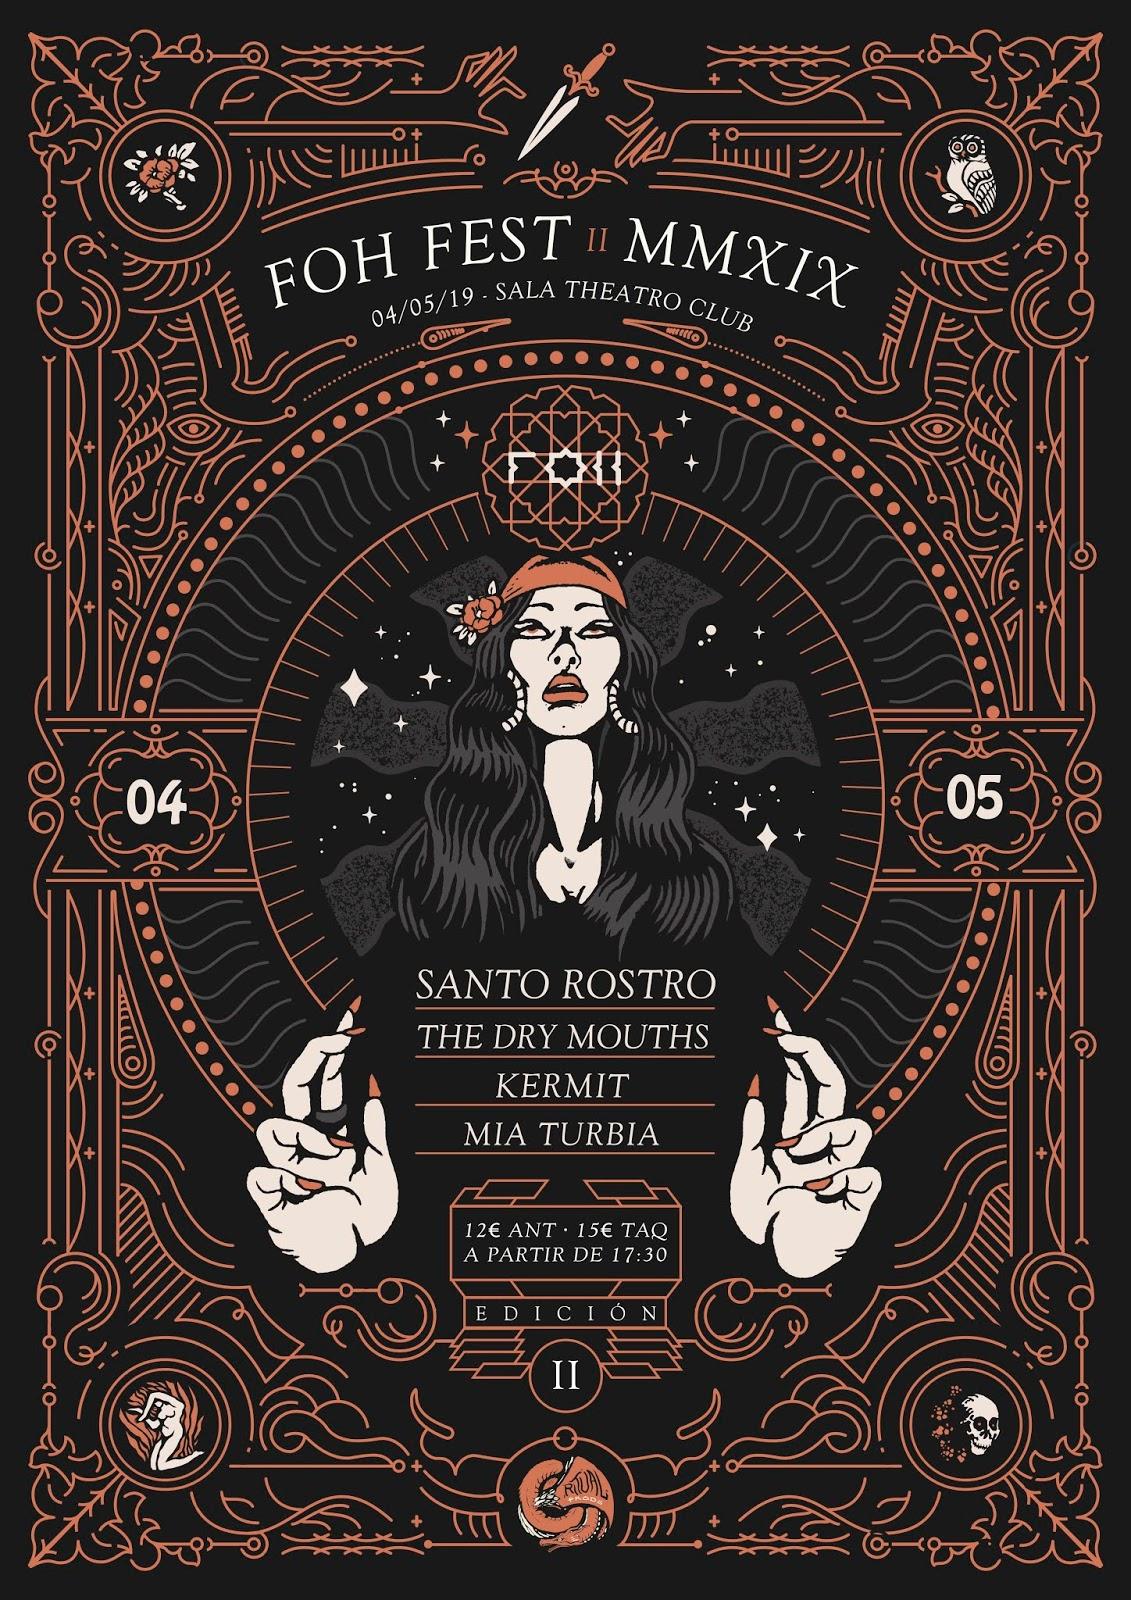 Foh Fest II